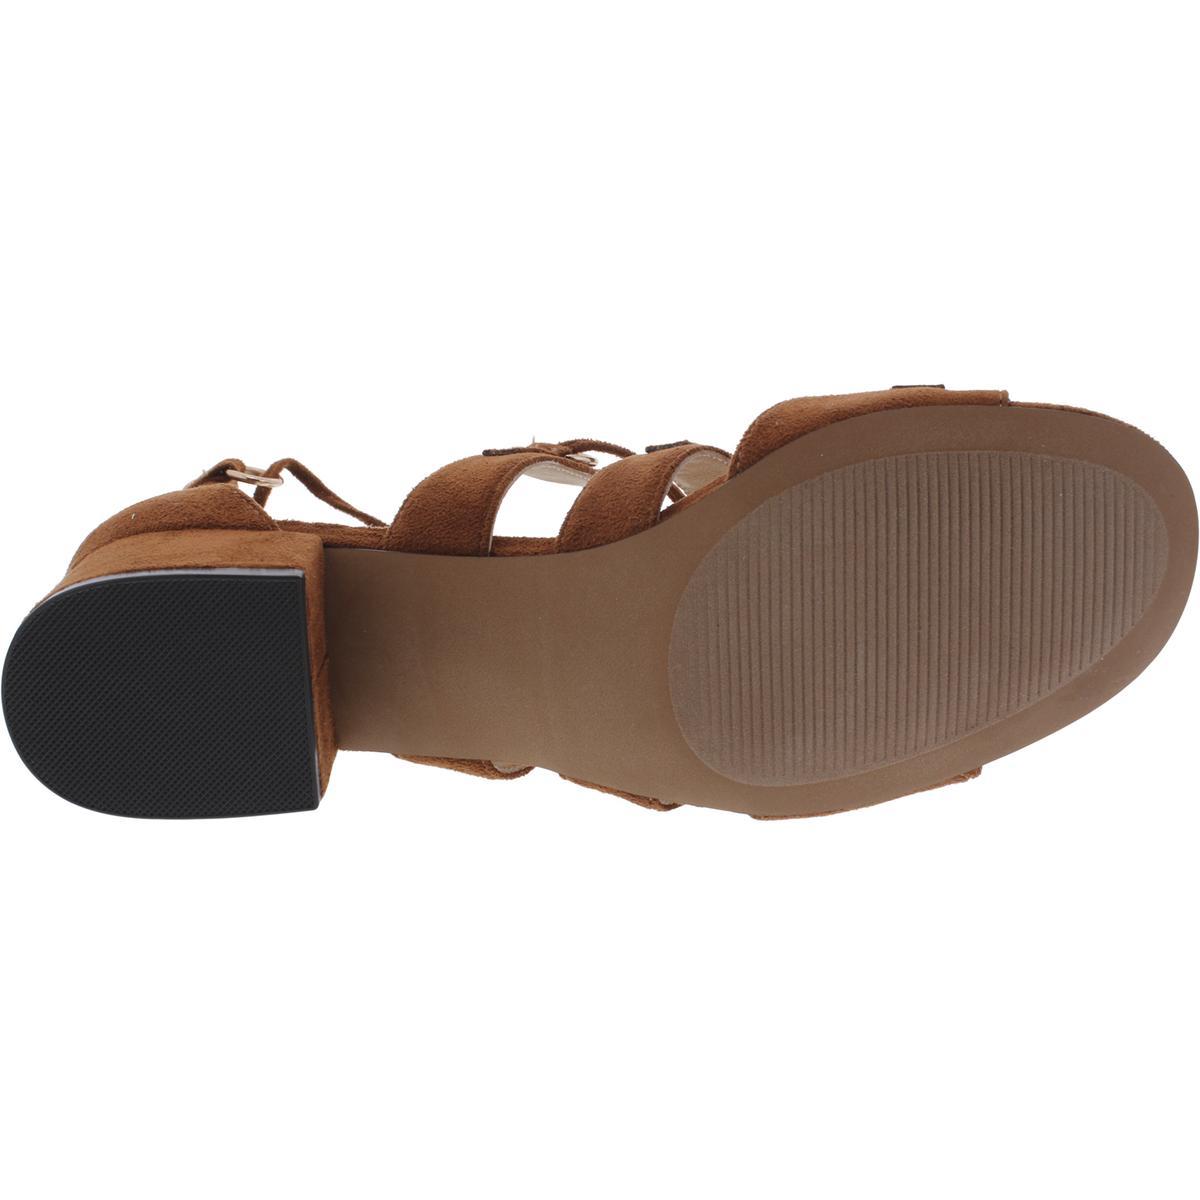 Design-Lab-Womens-Eldy-Block-Heel-Dress-Sandals-Shoes-BHFO-2676 thumbnail 10